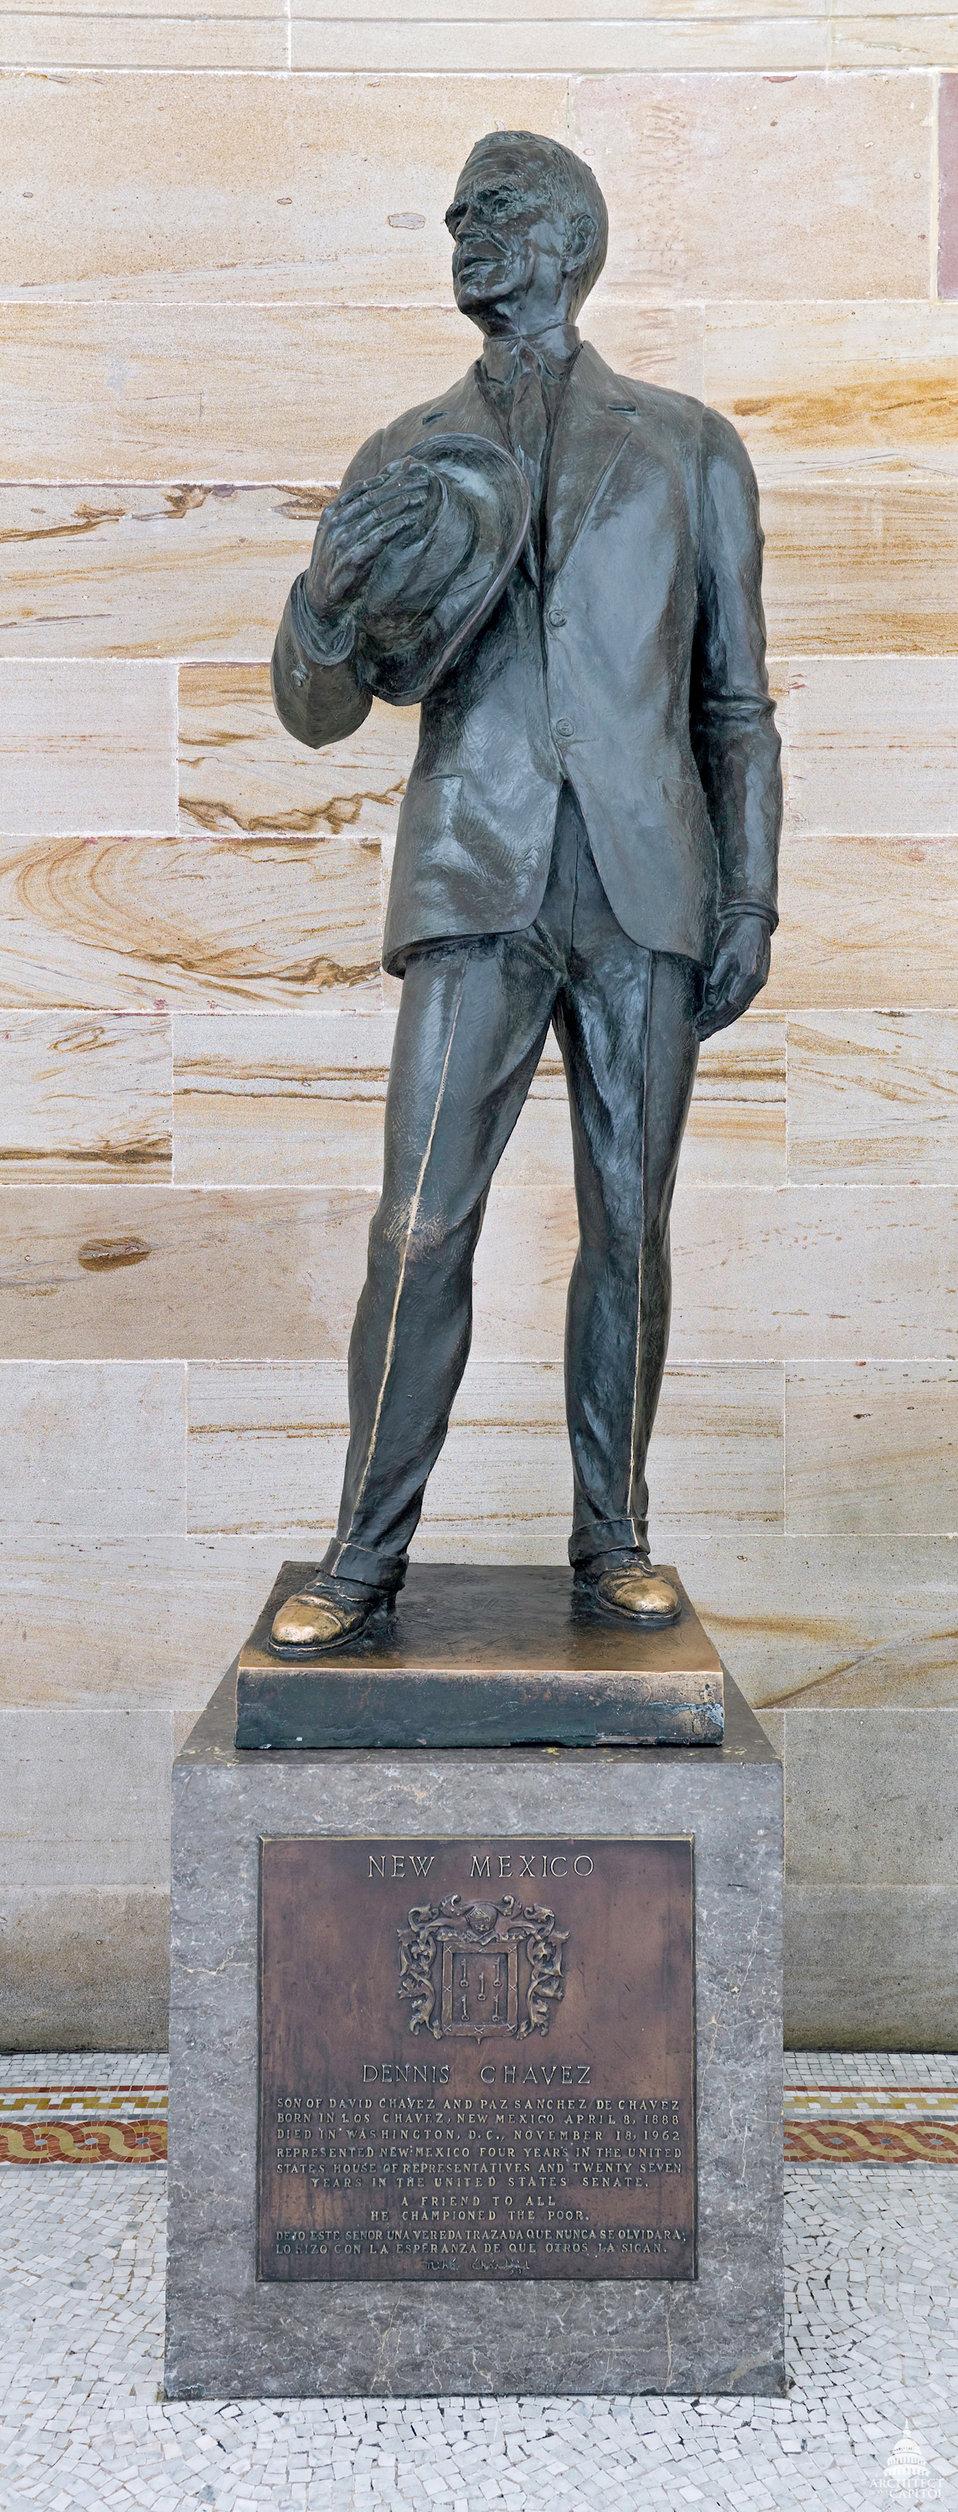 Dennis Chavez Statue